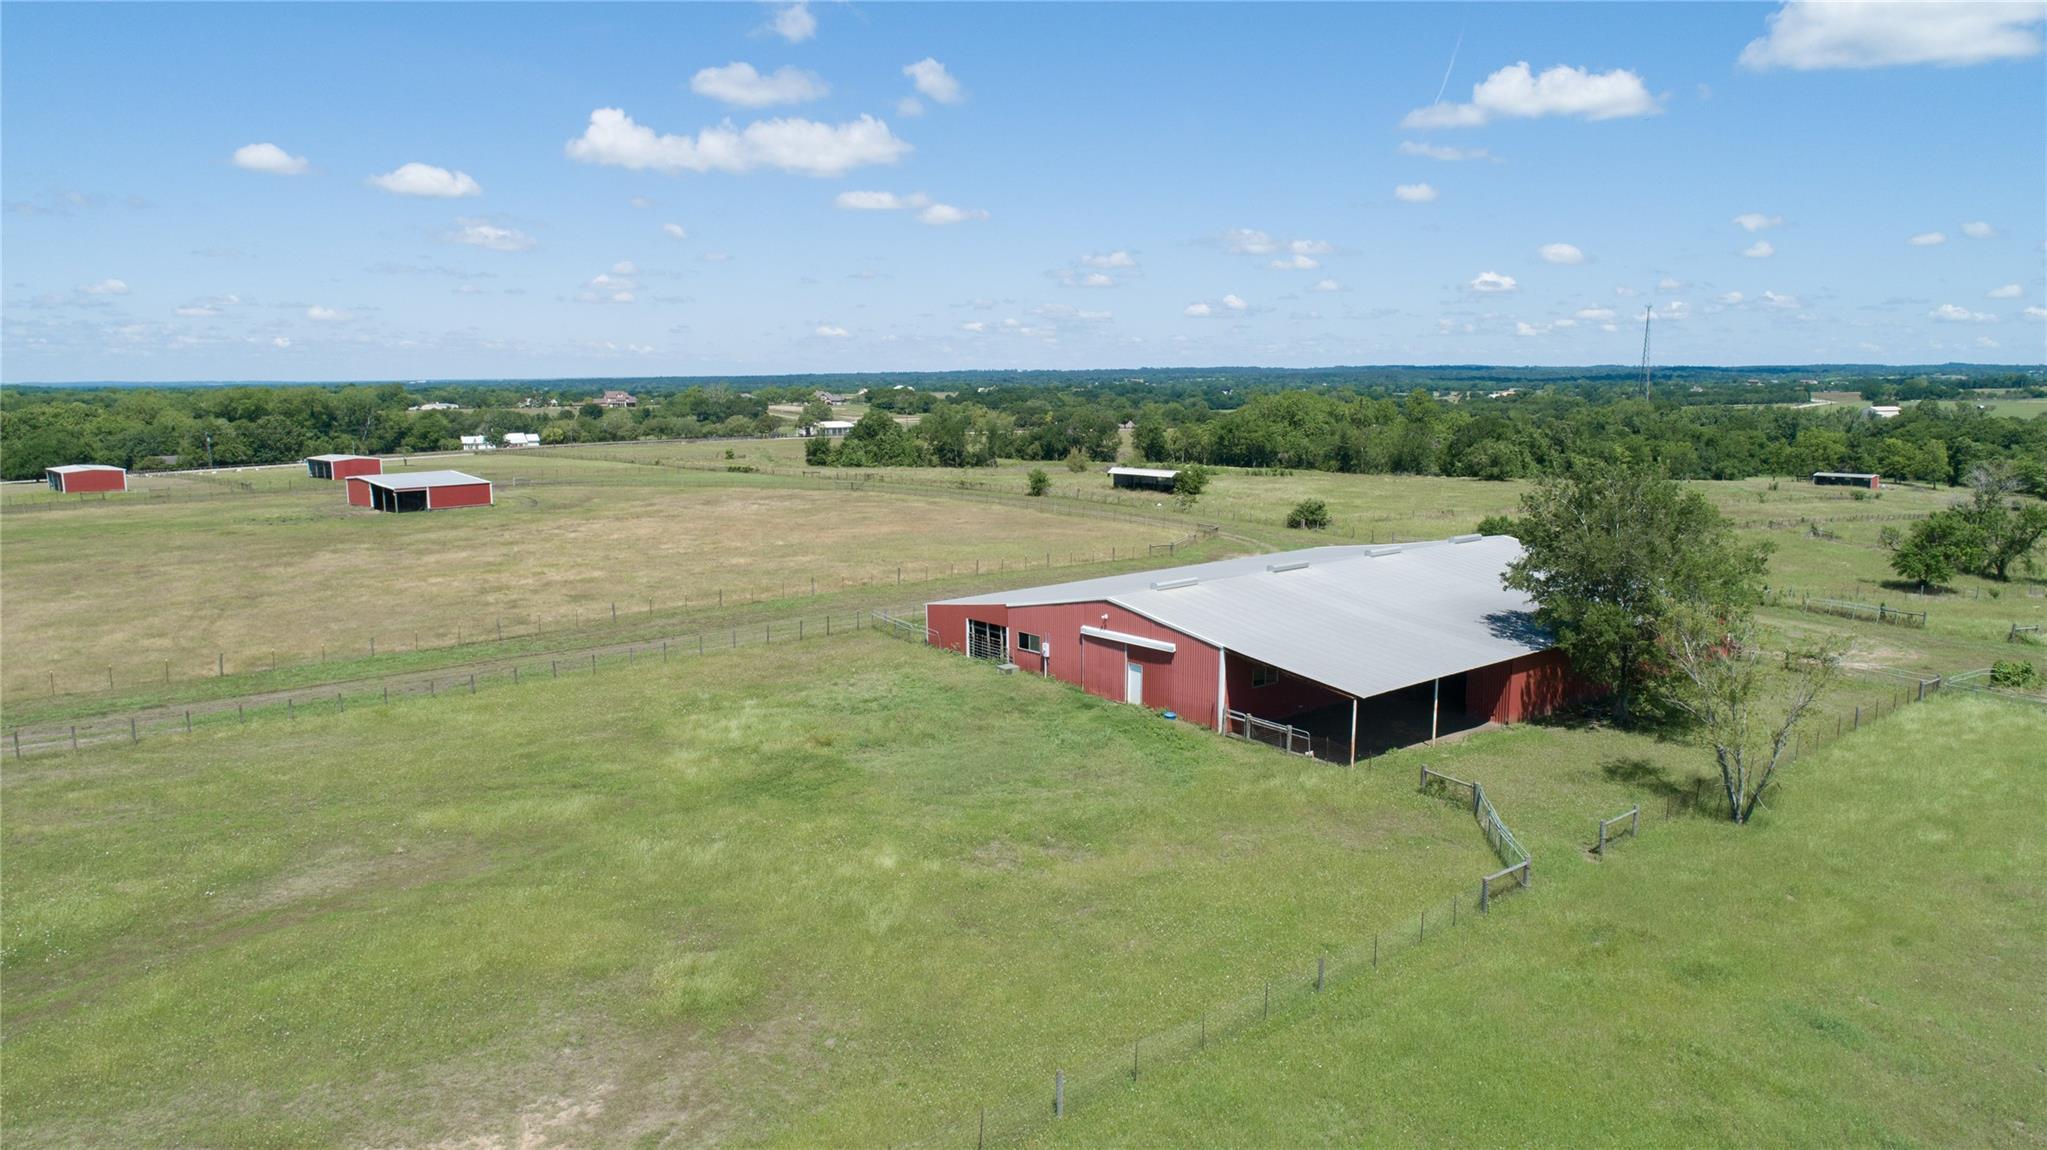 12409 FM 362 - 30 Acres Property Photo - Navasota, TX real estate listing